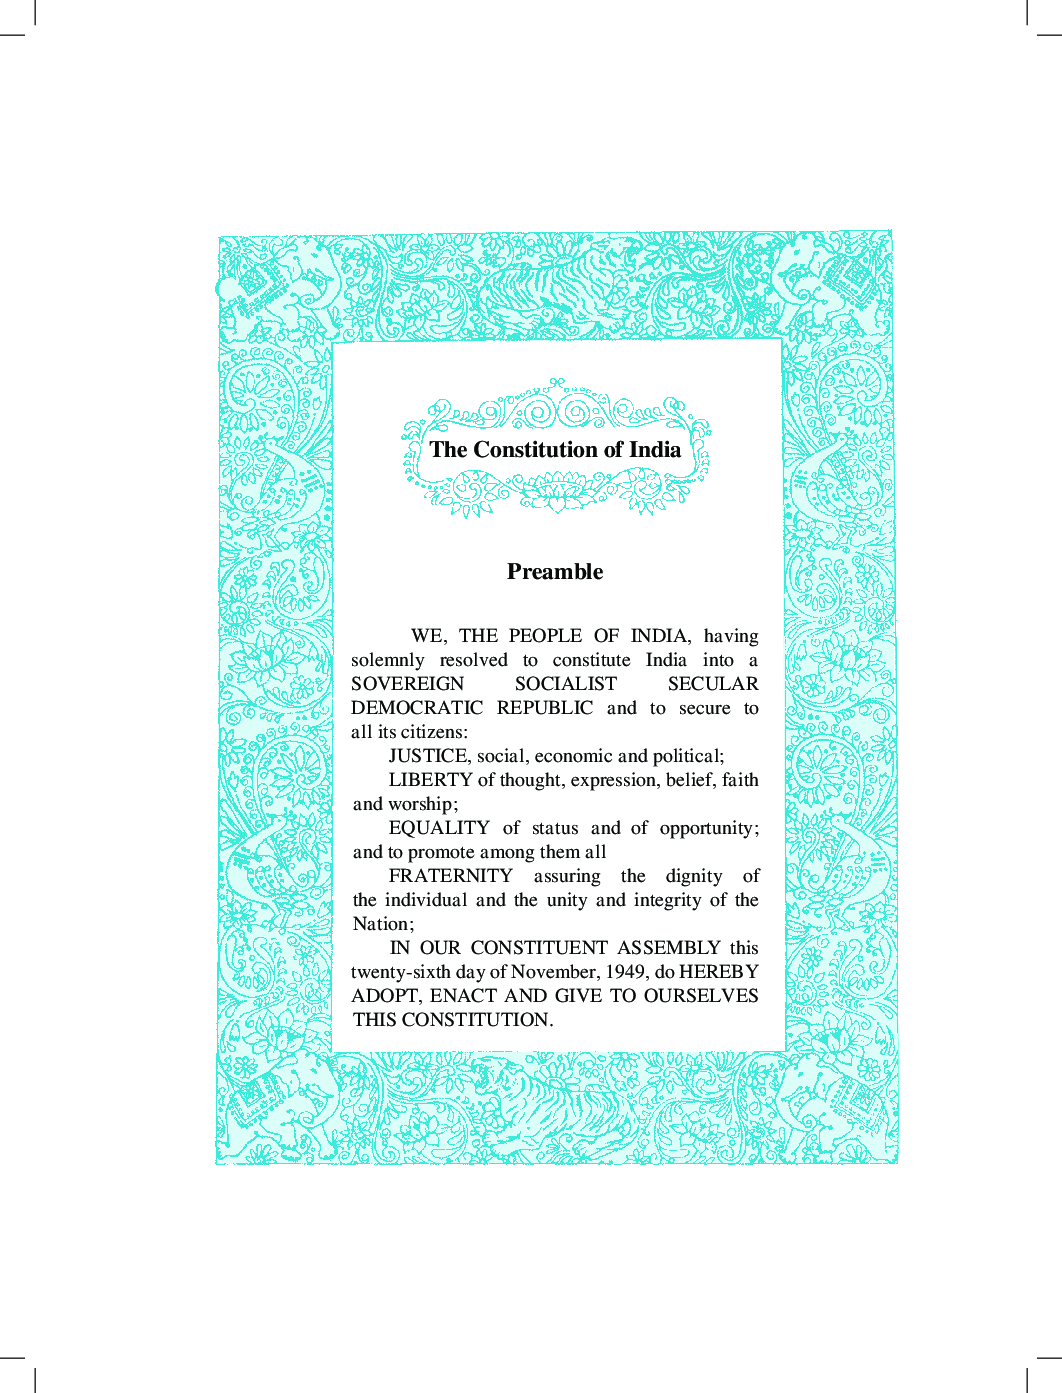 Maharashtra School Textbook My English Book (Hindi) For Class-4 - Page 4